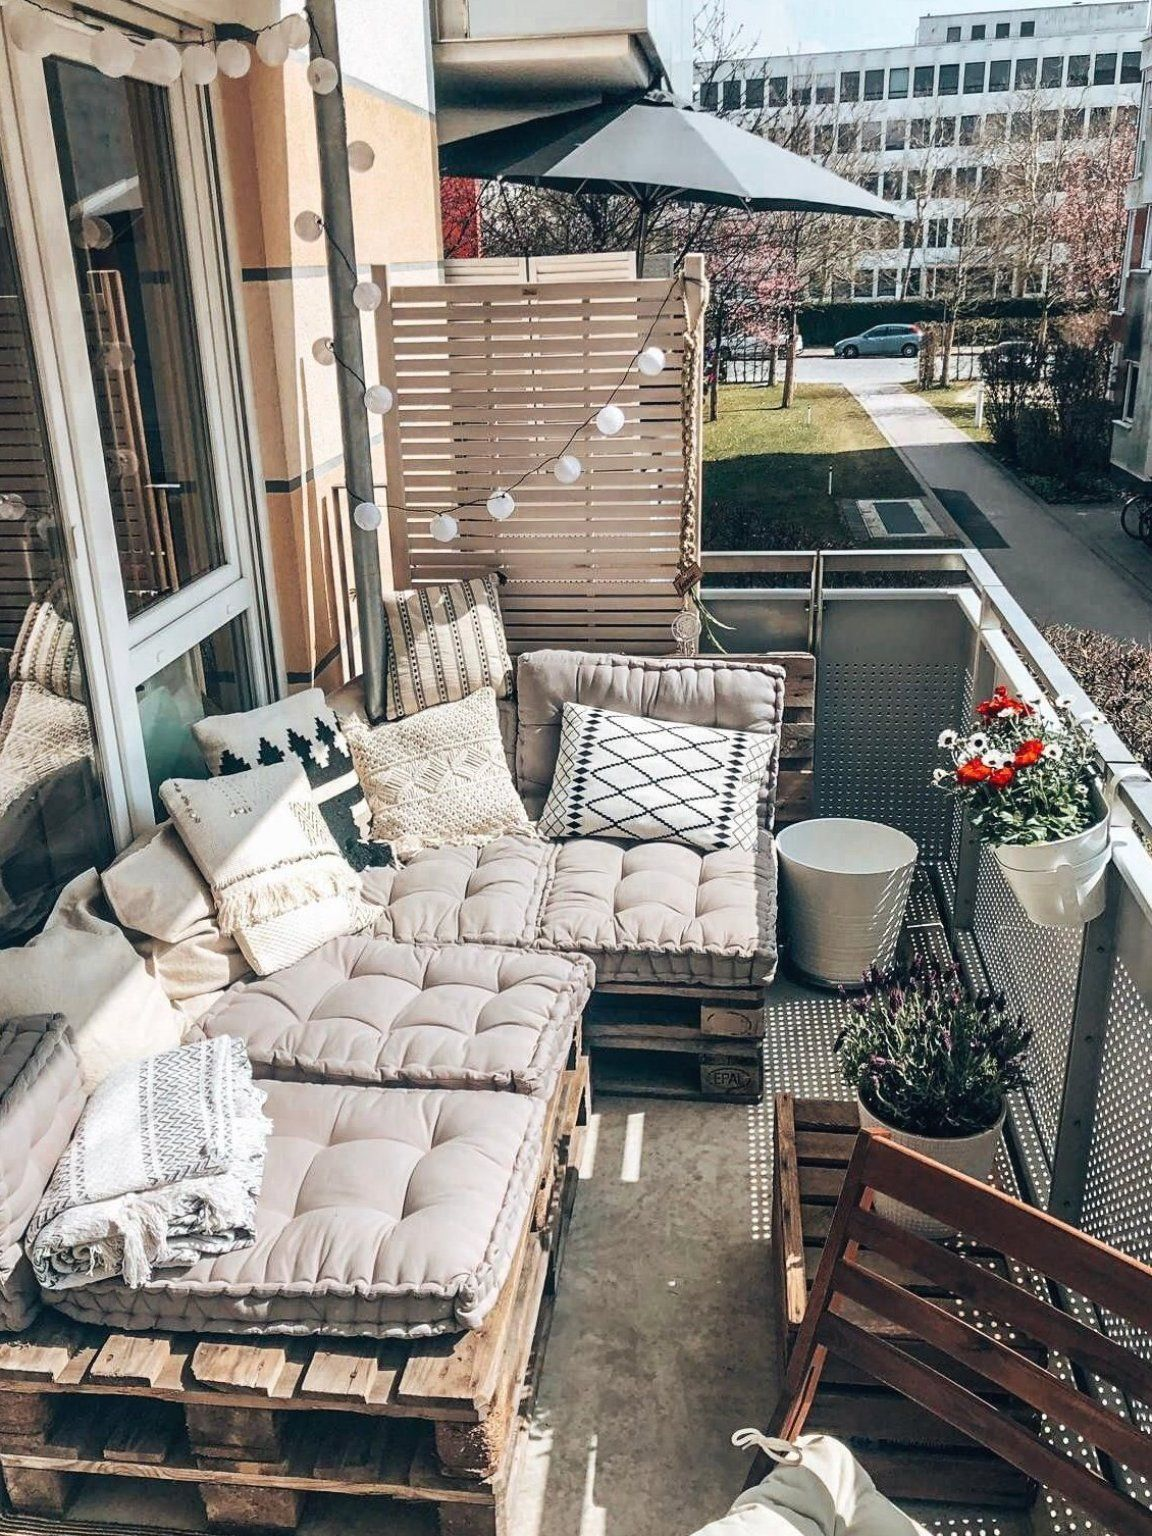 Sch Ner Balkon Mit Selbstgebautem Sofa Aus Europaletten In M Nchen Wggesucht Wg Balkon Ba In 2020 Small Balcony Decor Balcony Decor Apartment Balcony Decorating